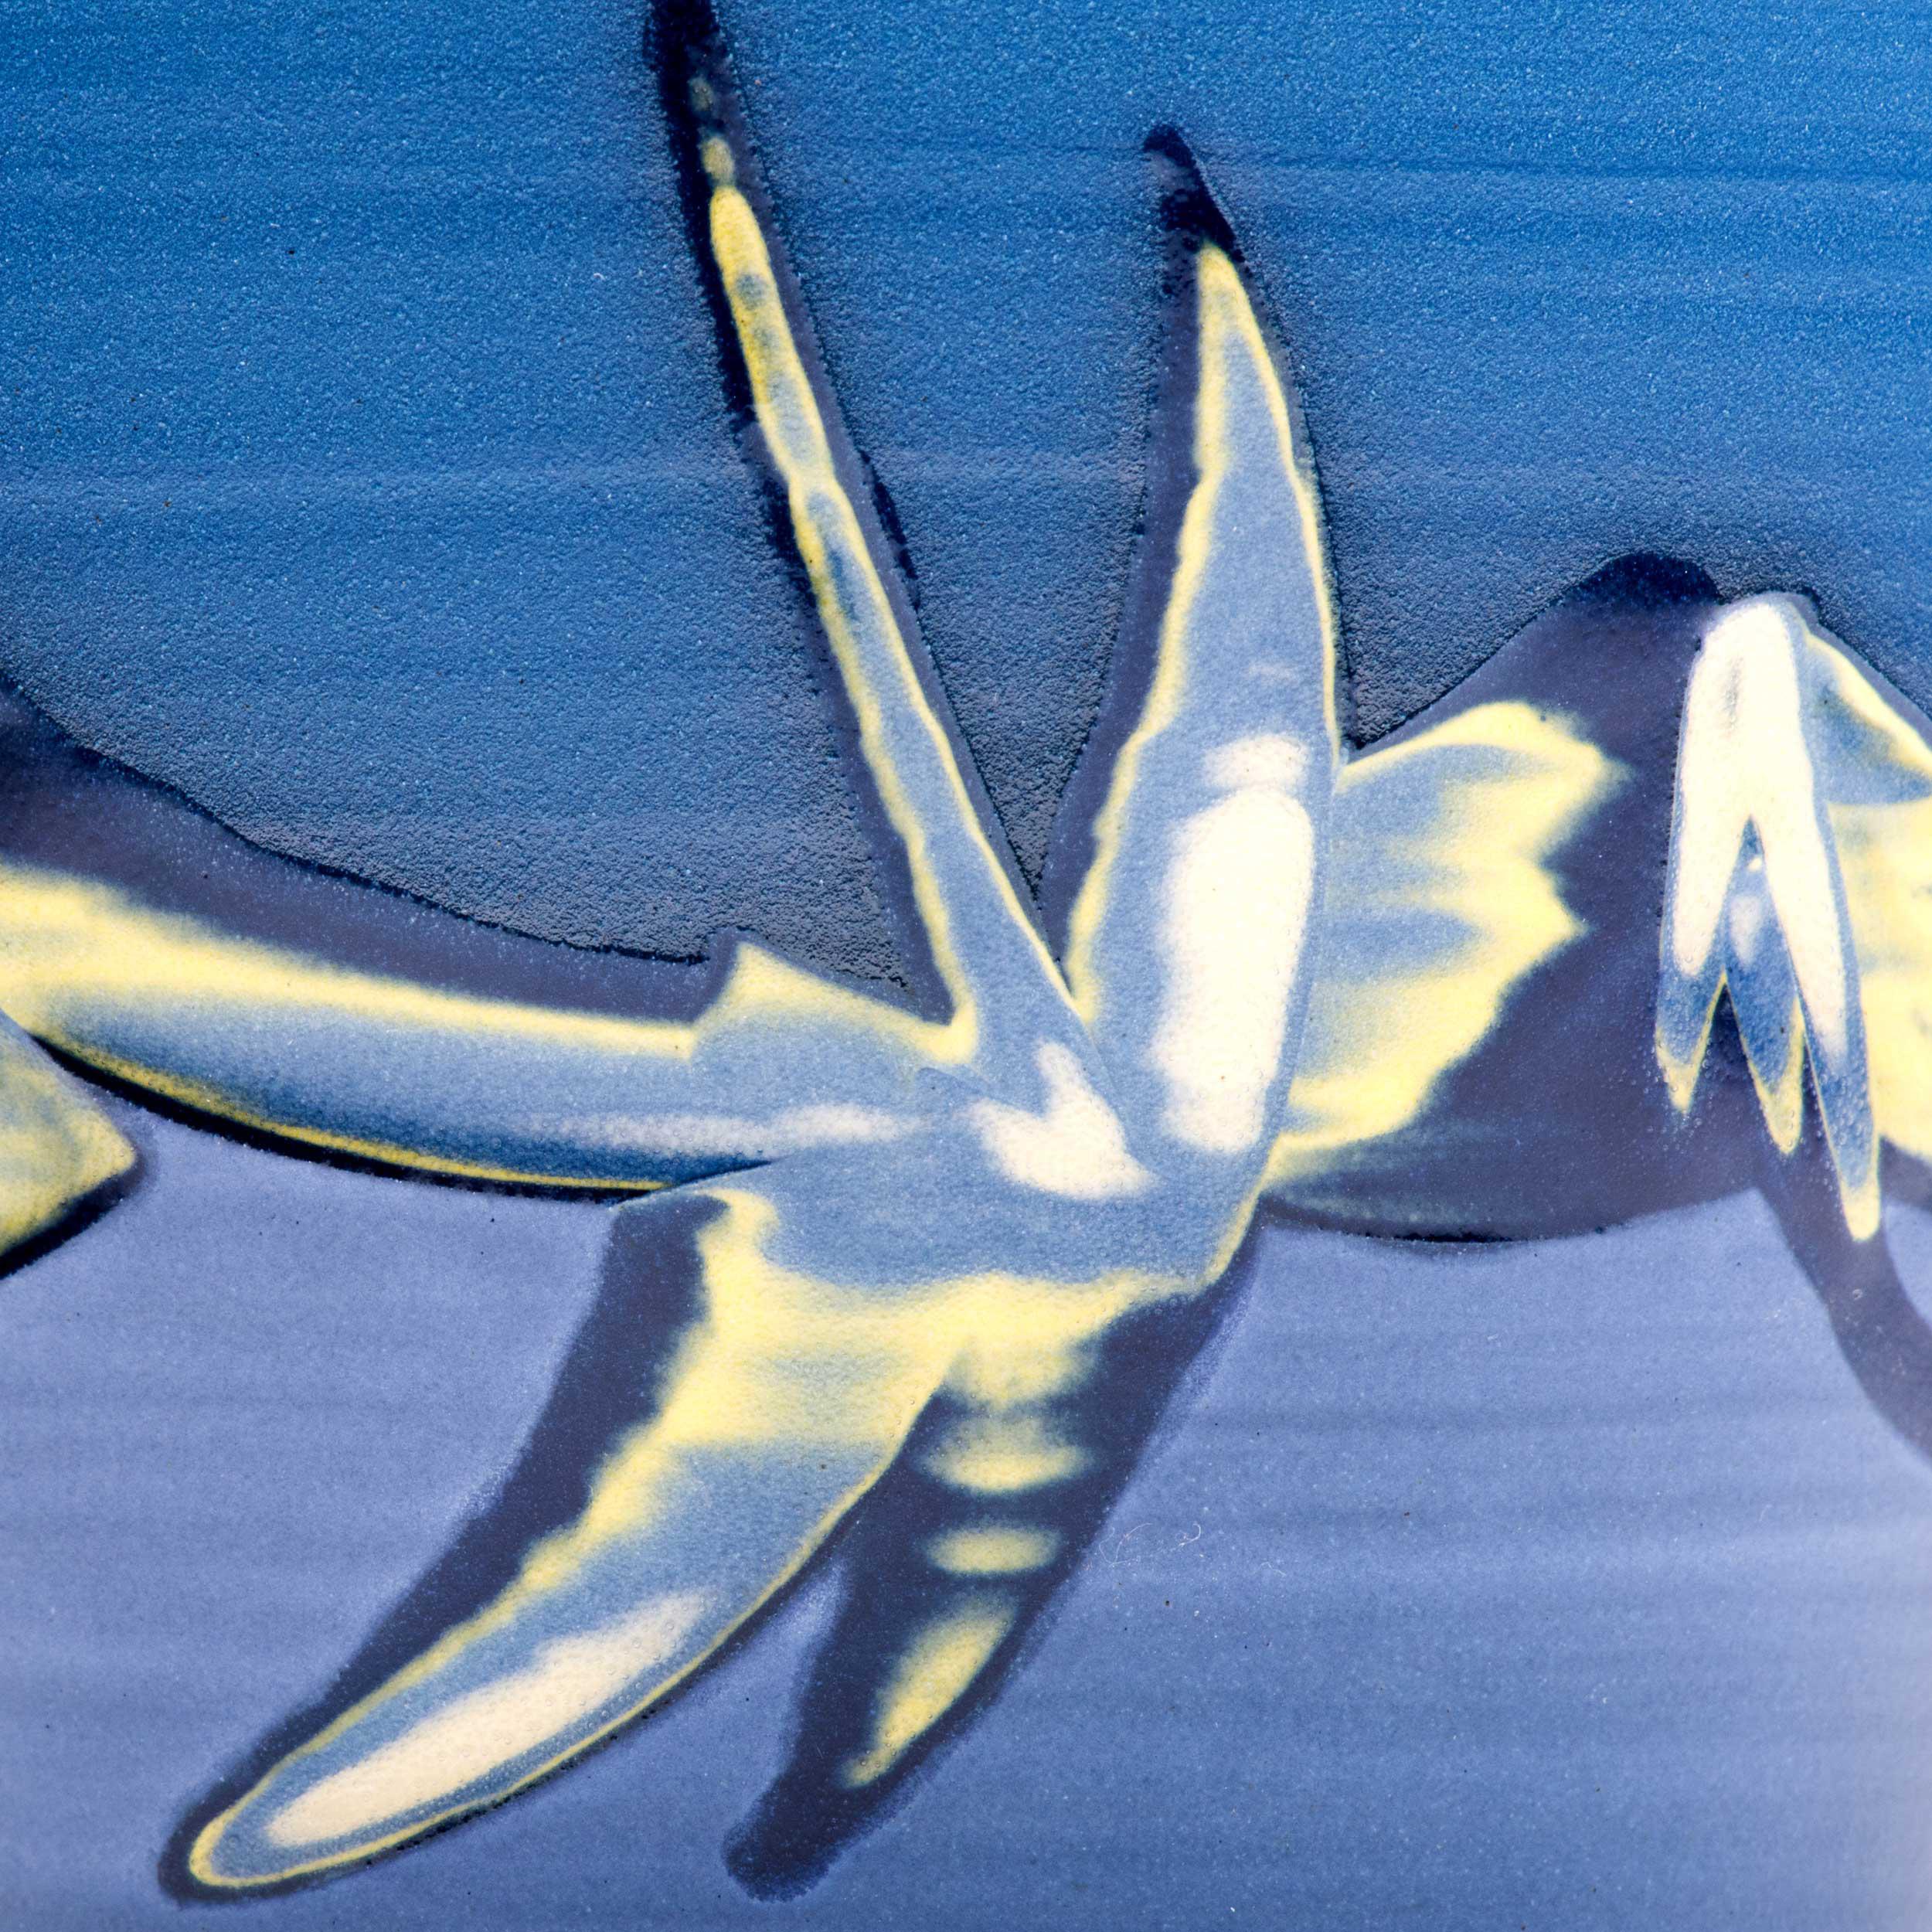 Sgraffito Blue Ceramic Coast Vase Detail by Rowena Gilbert